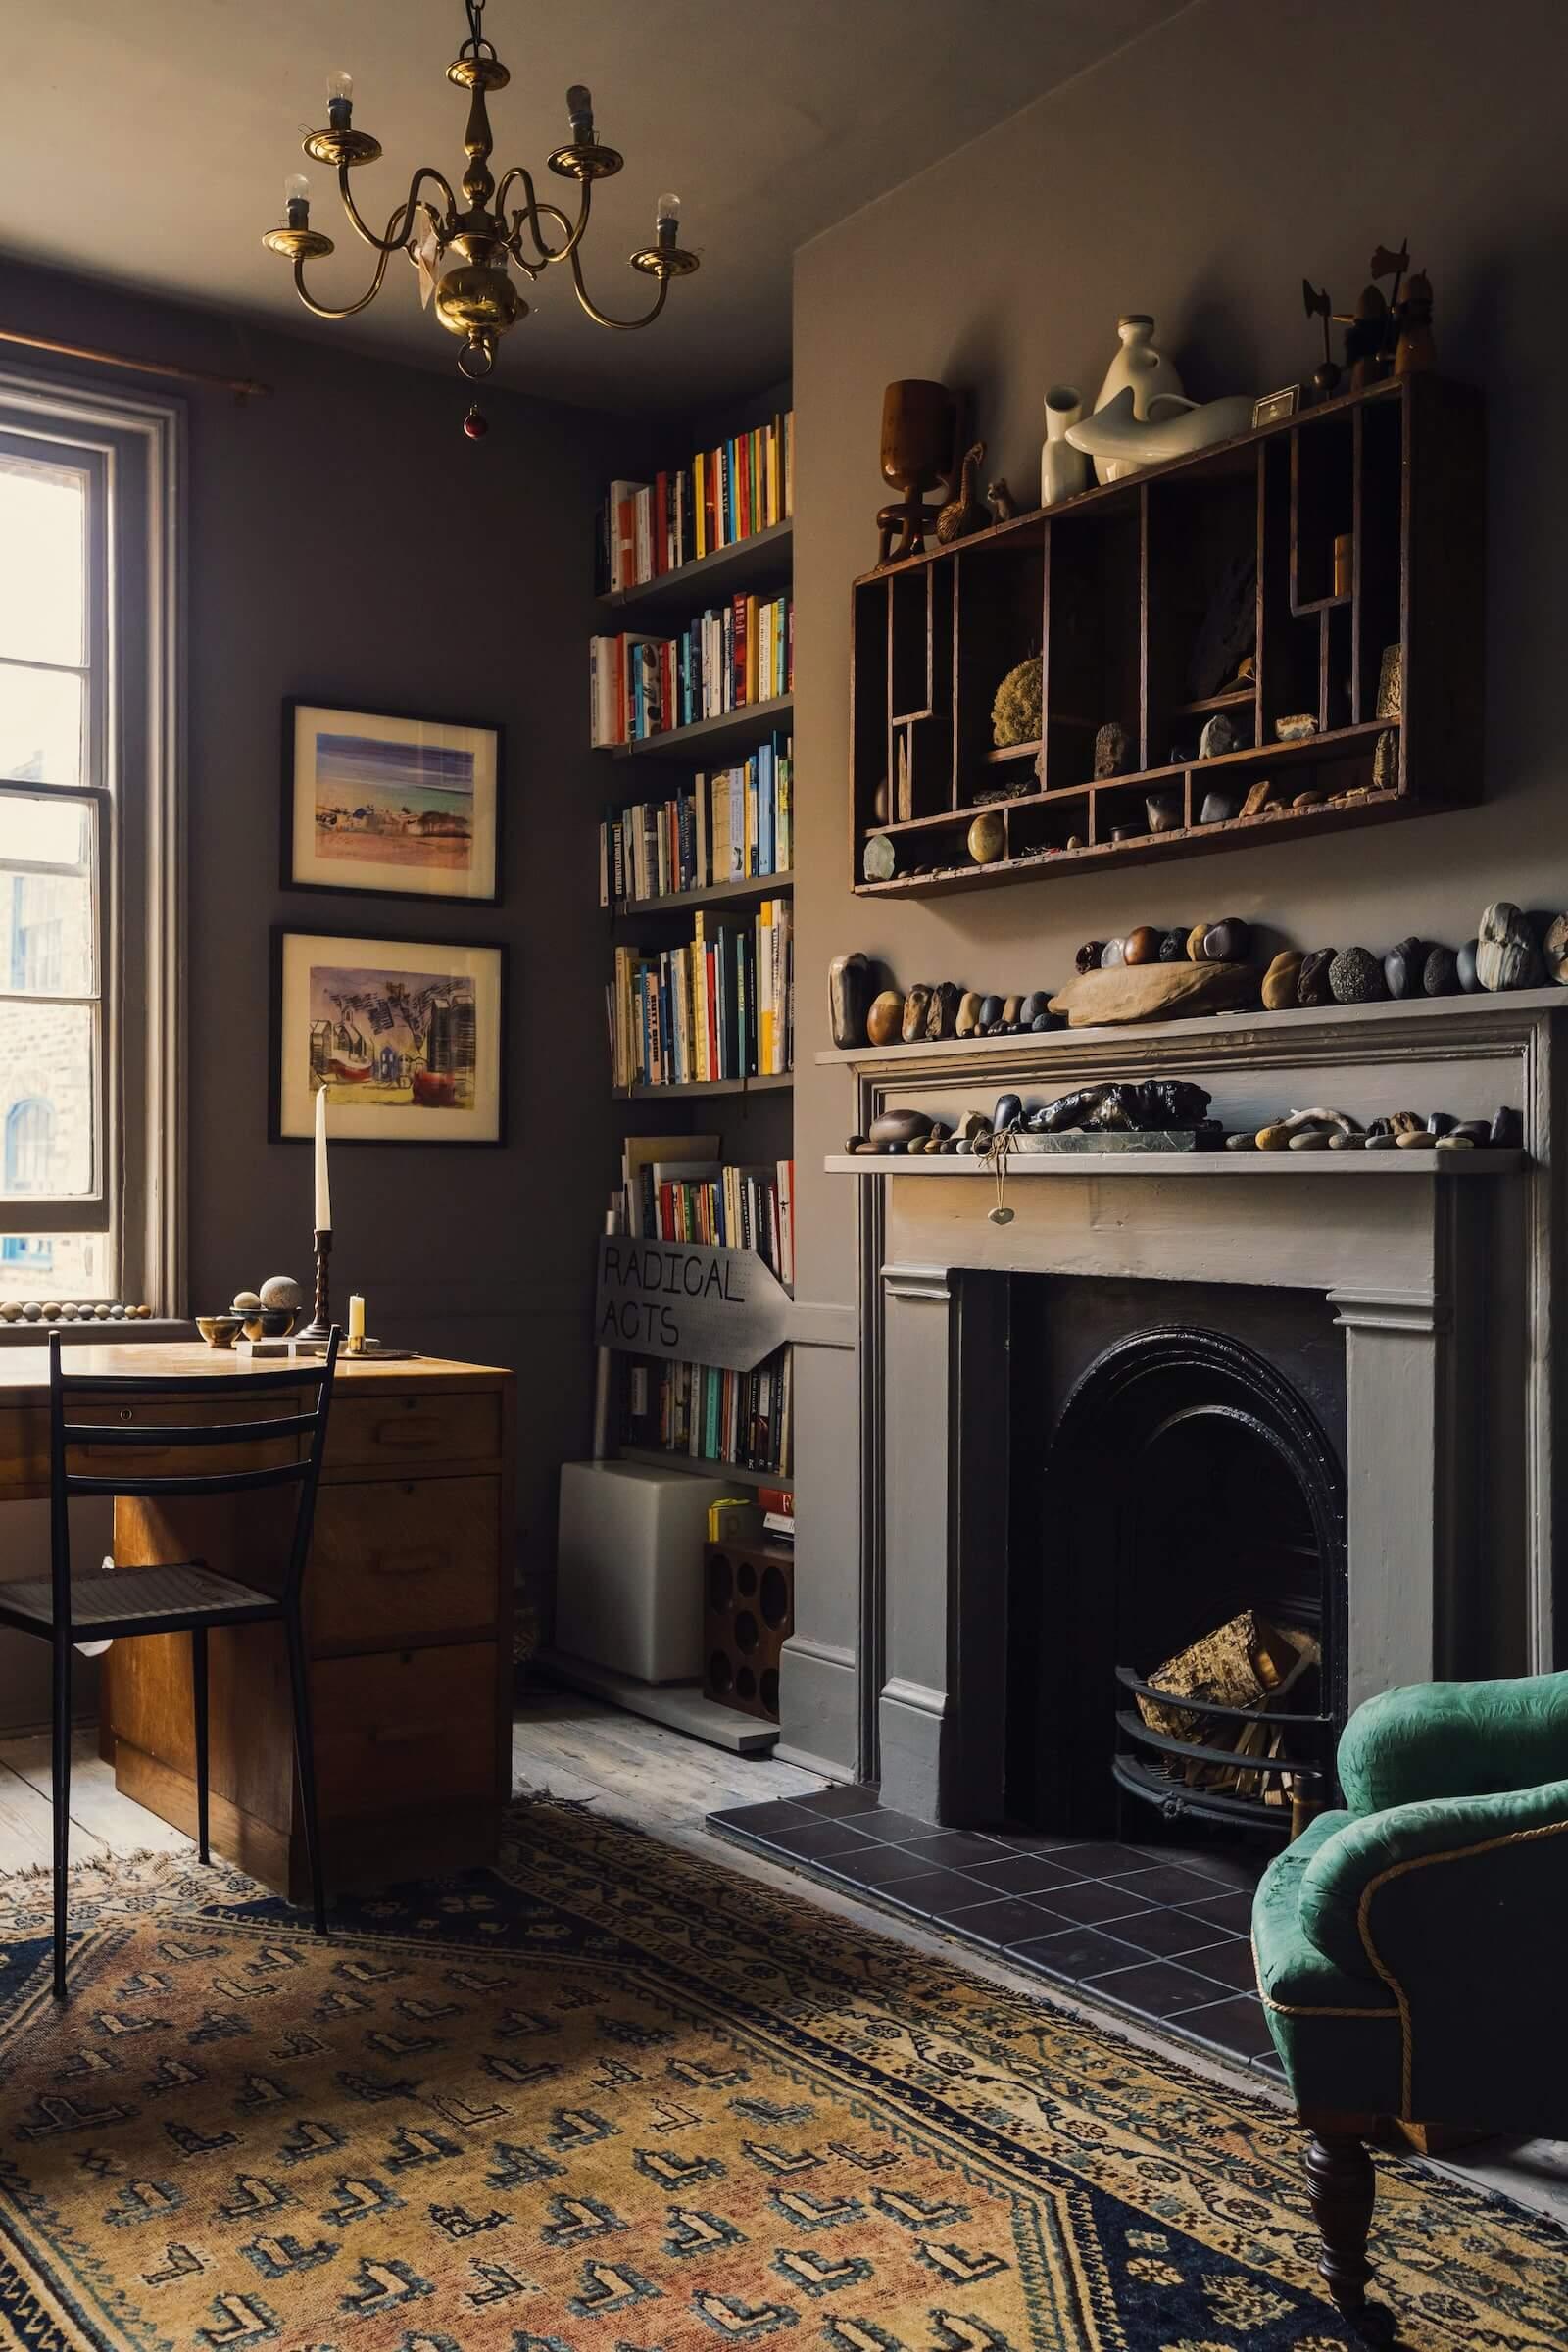 Moody Colors in a Unique Historic Apartment